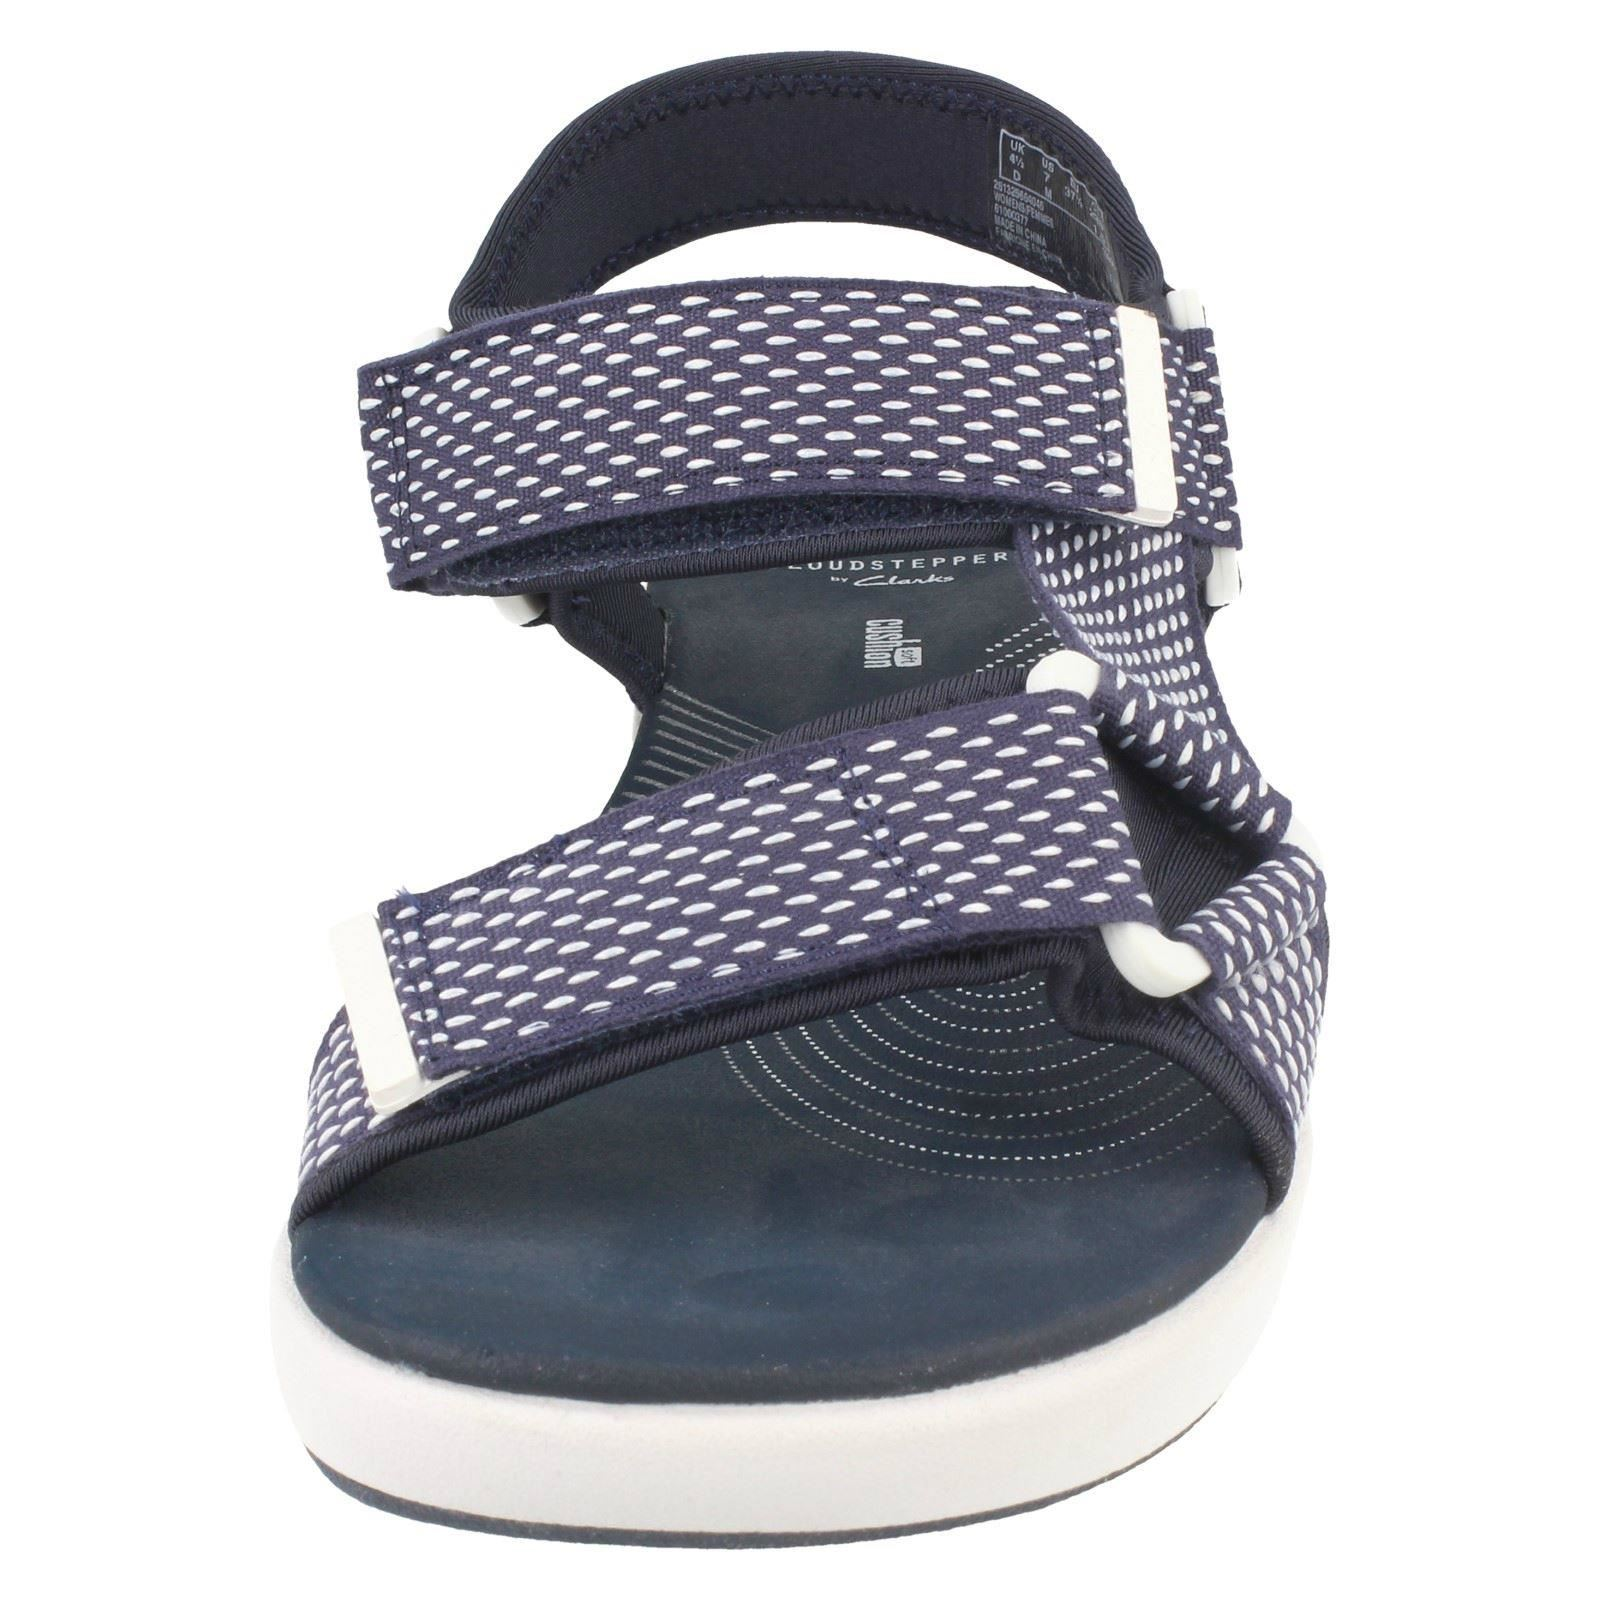 Ladies Clarks Casual Strappy Sandals /'Brizo Cady/'